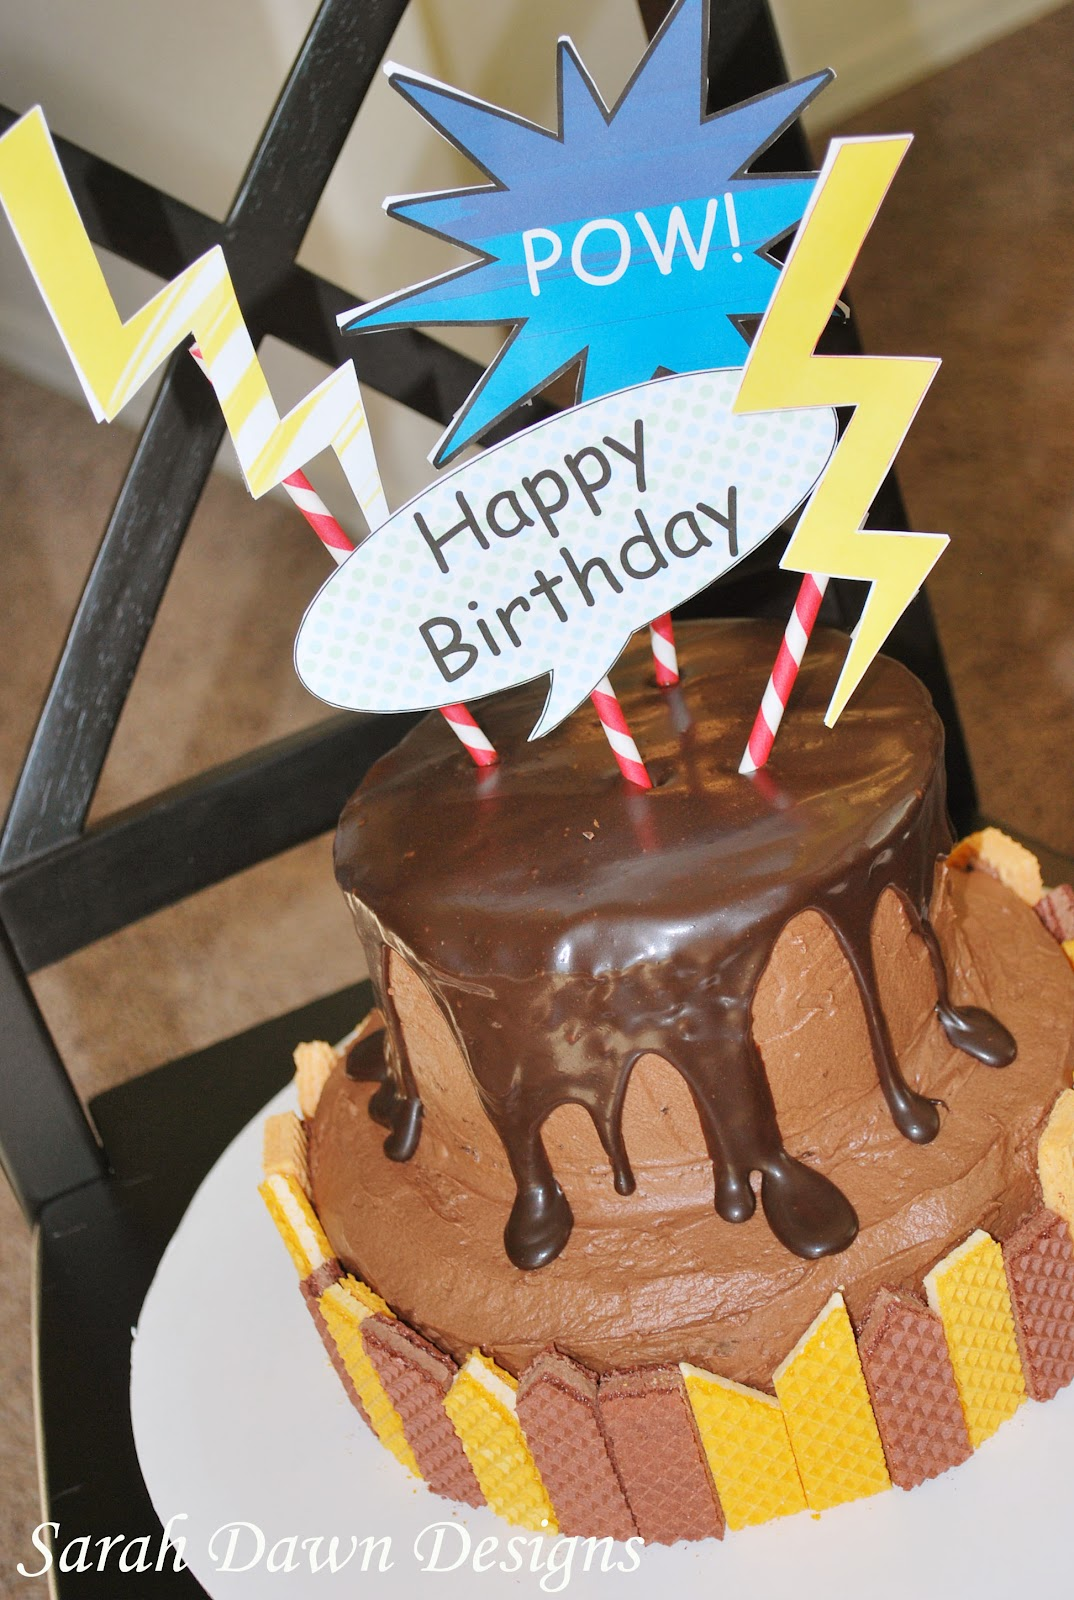 Sarah Dawn Designs Coolest Birthday Cake Superhero Style